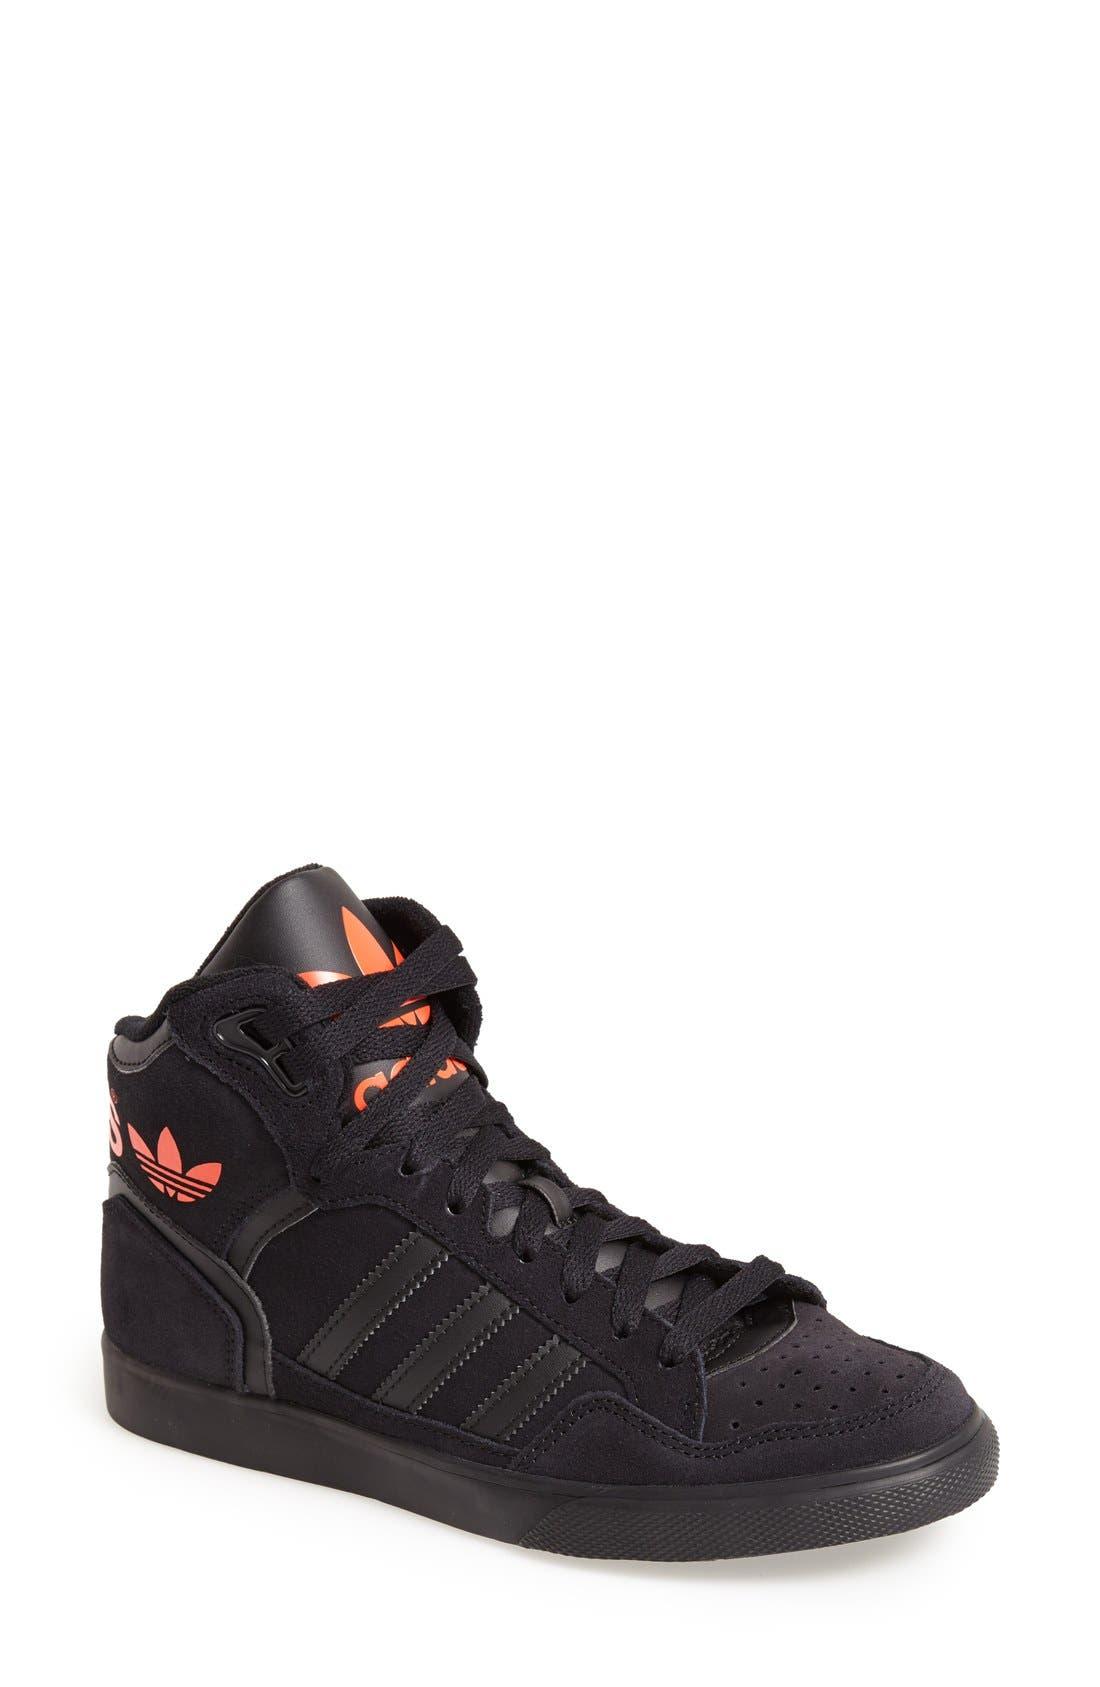 Main Image - adidas 'Extaball' Sneaker (Women)